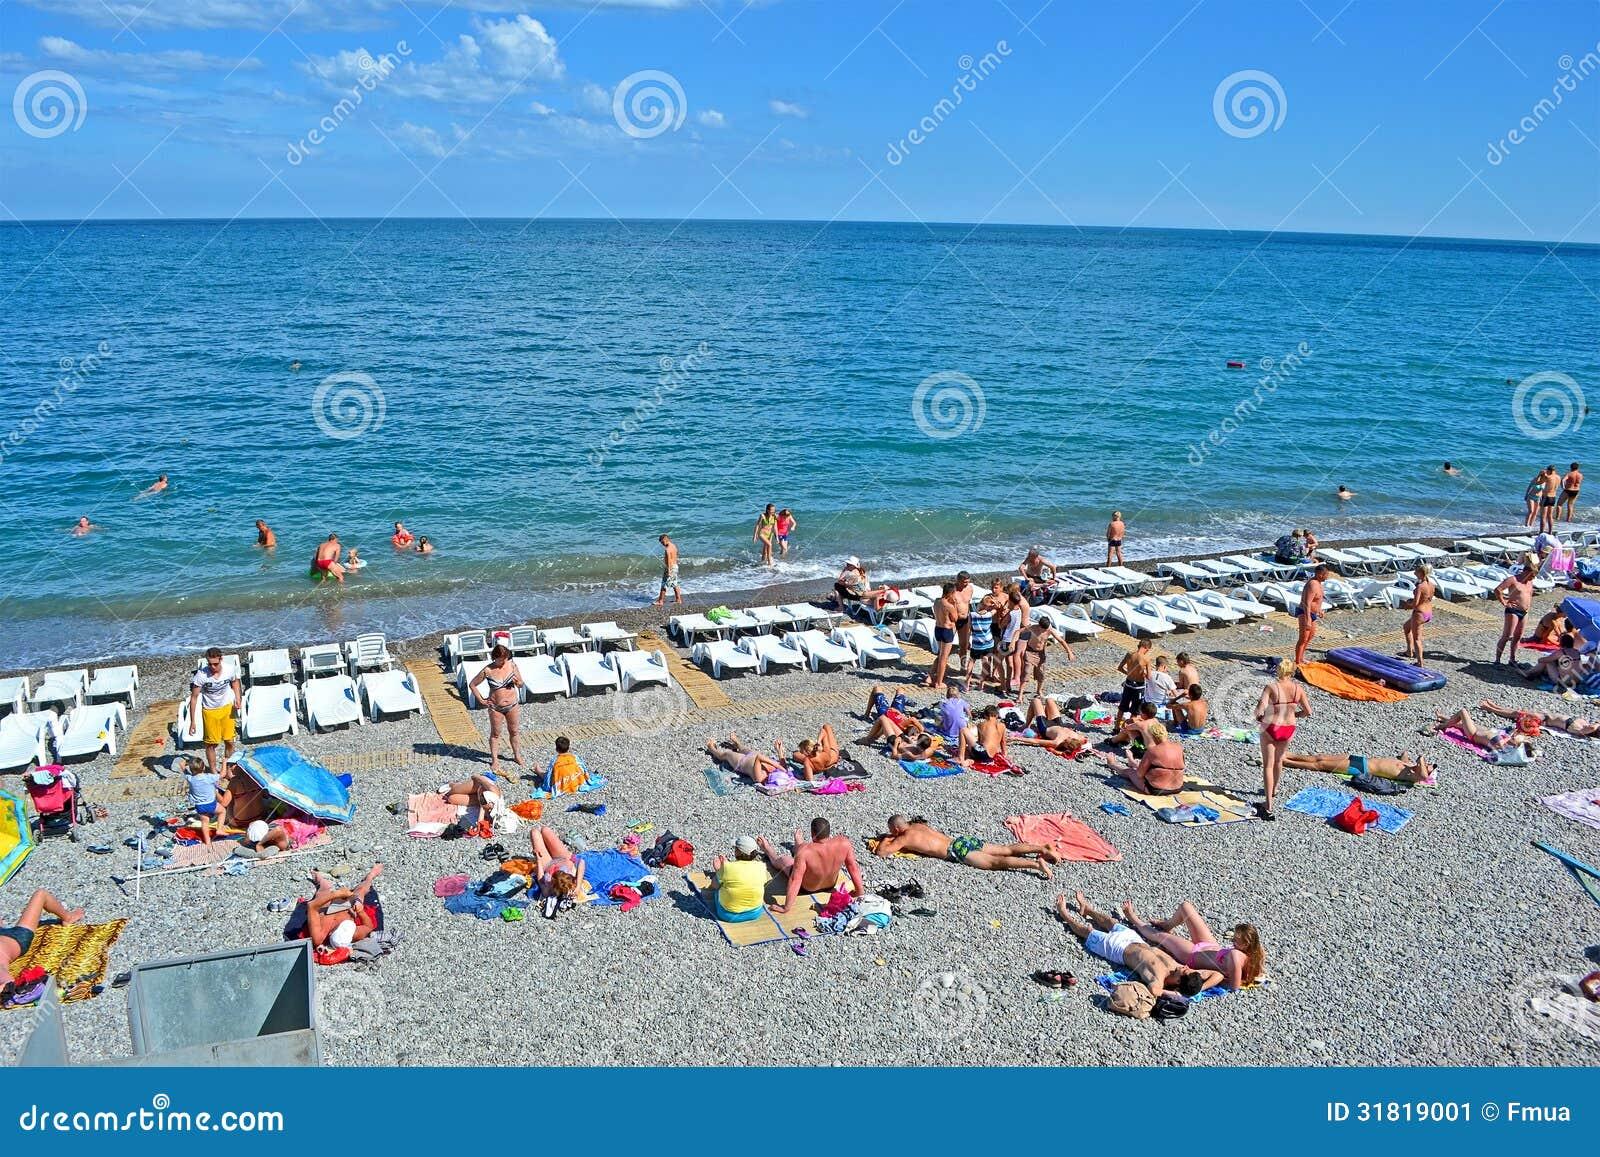 Resort People On The Public Pebble Beach Near Bla